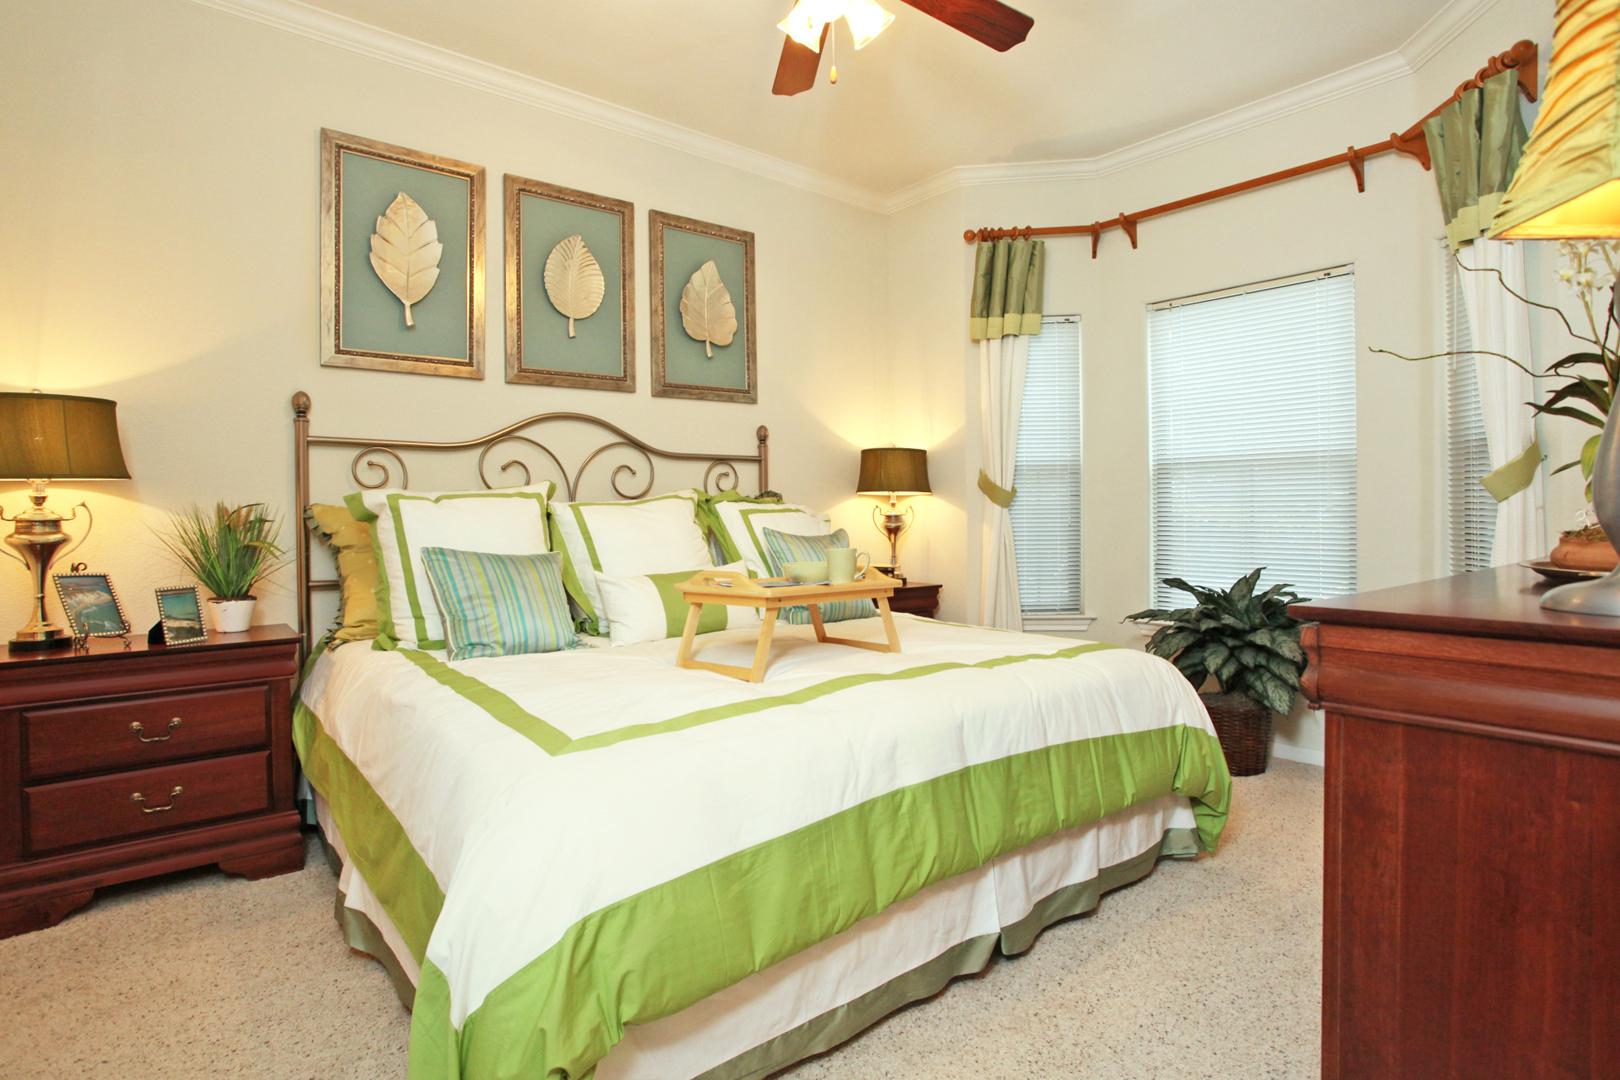 The Montecristo Apartments in San Antonio, TX